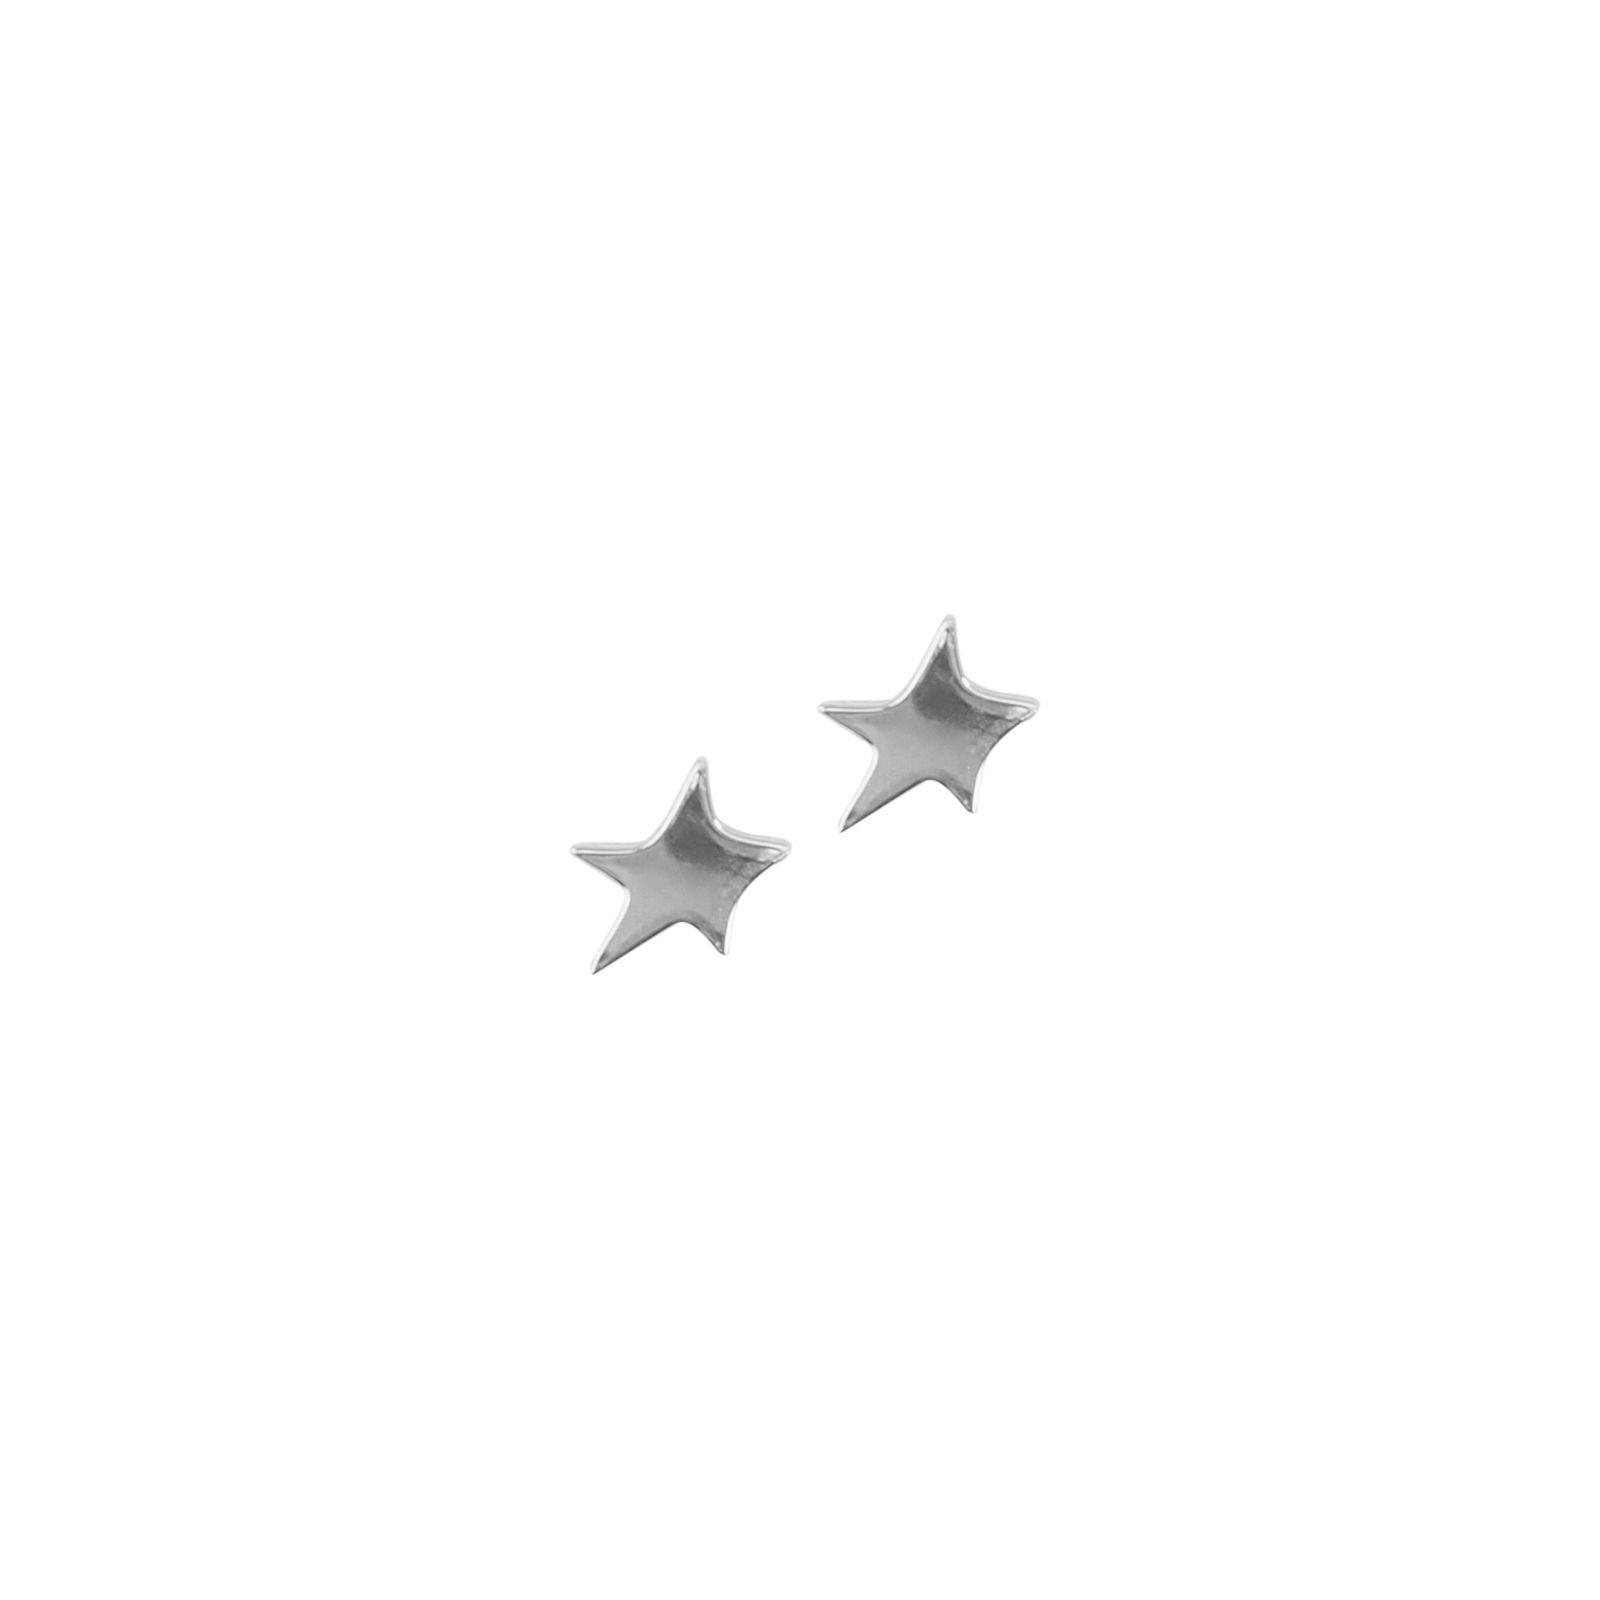 LUZ handmade star zilver